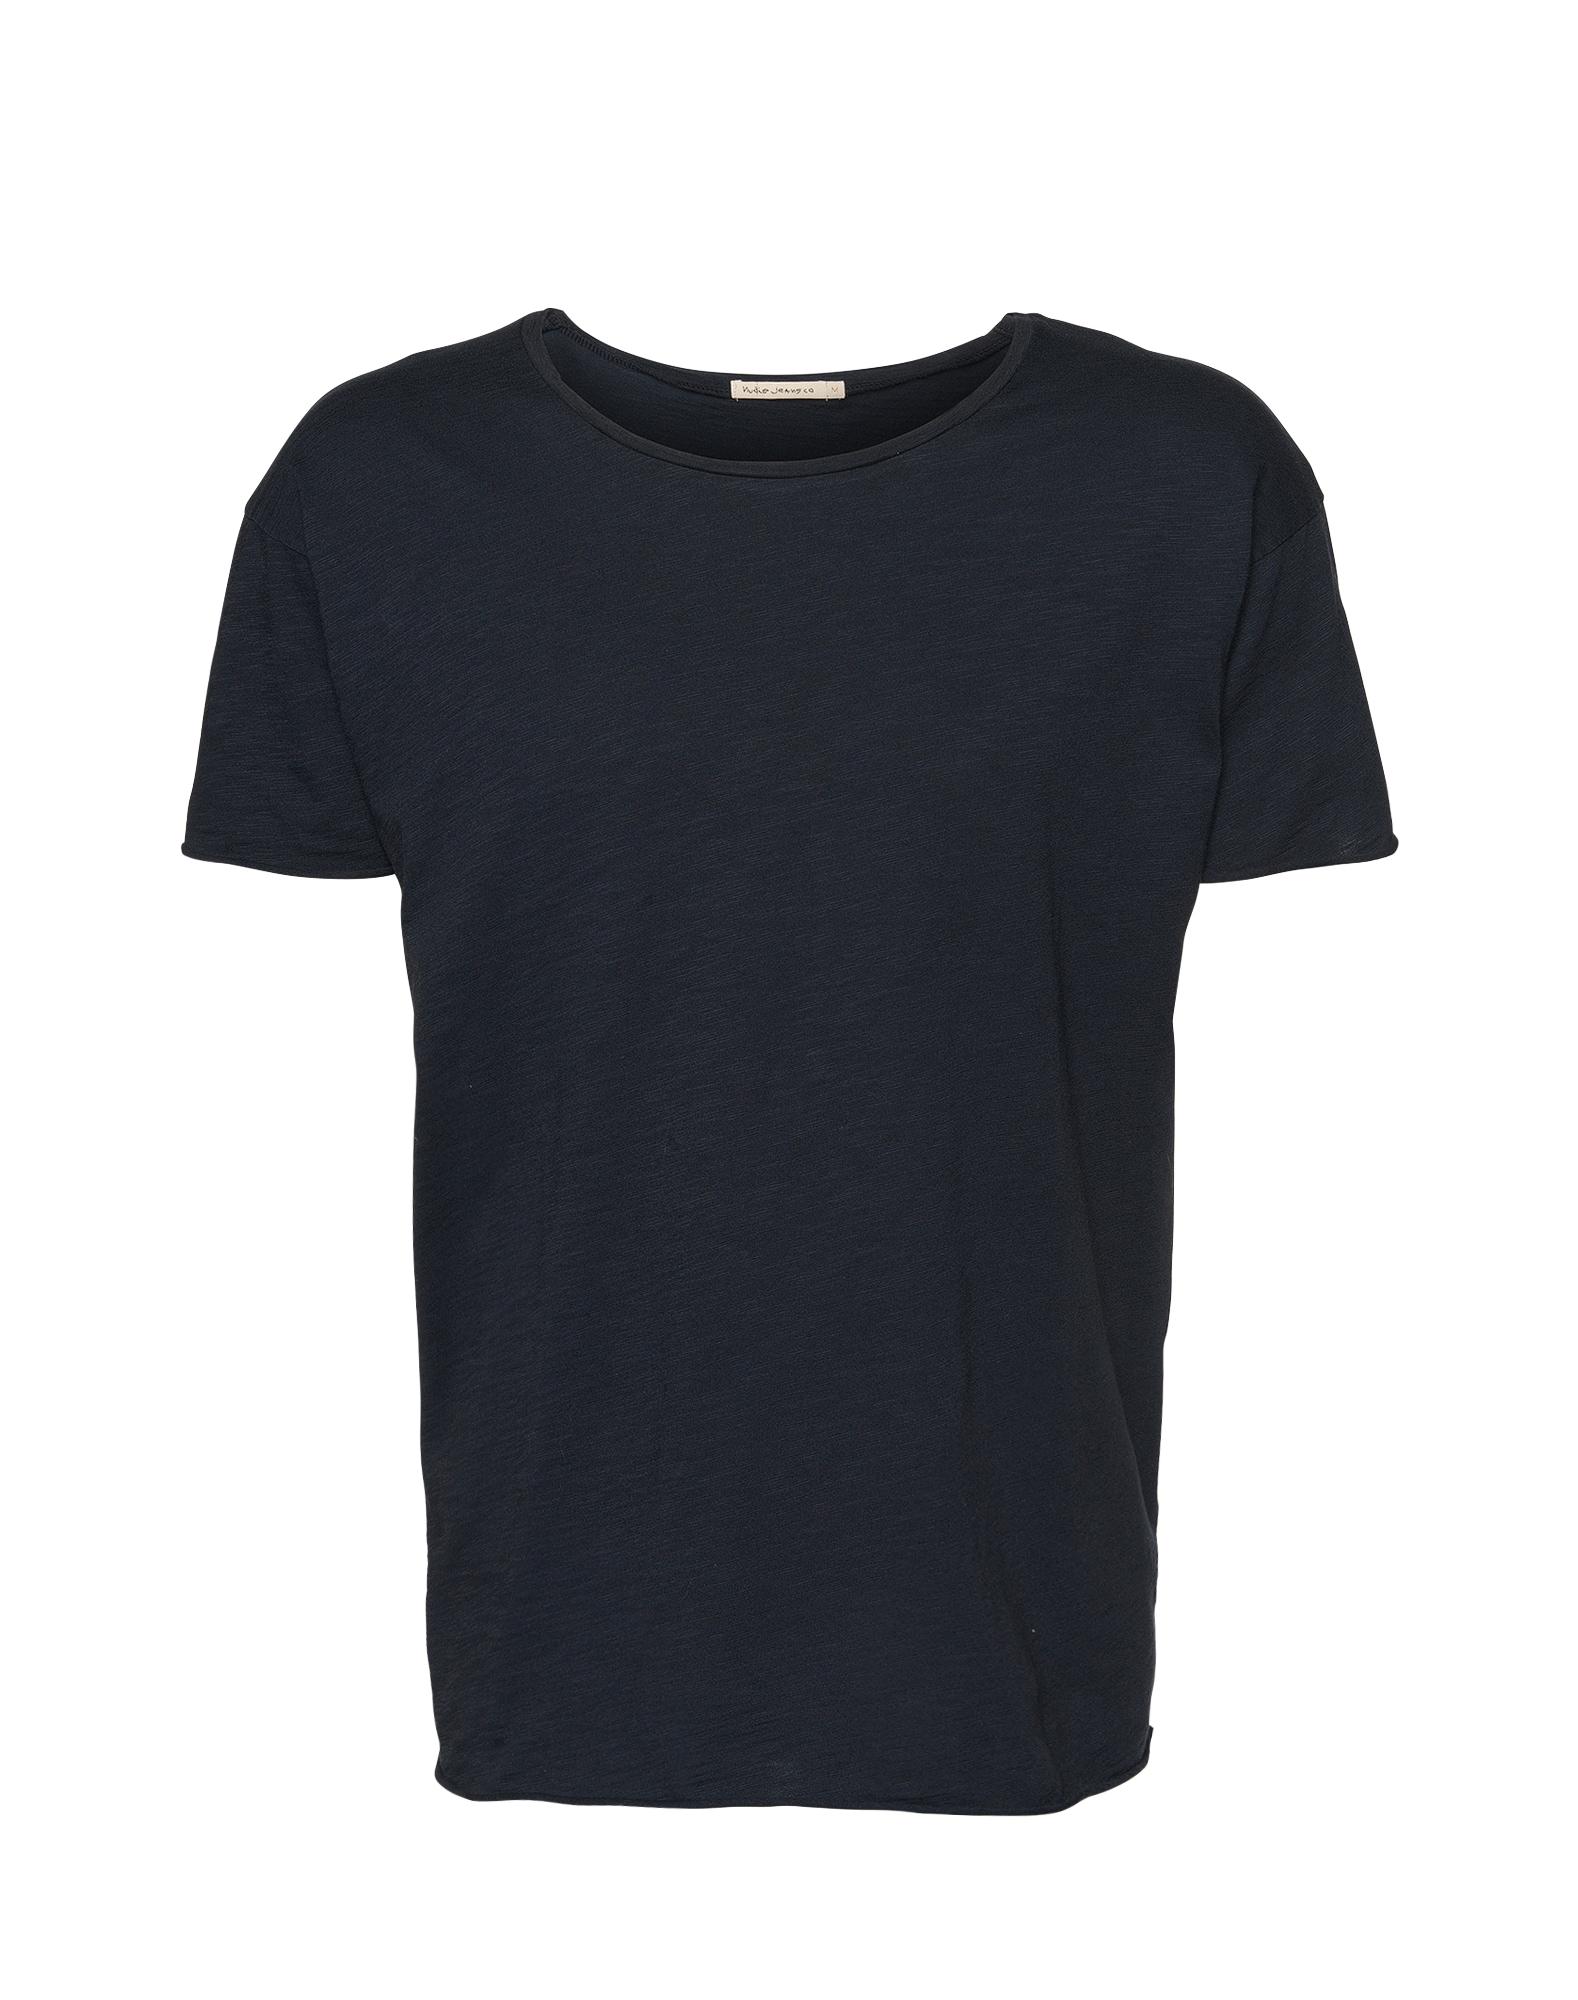 Nudie Jeans Co Marškinėliai 'Roger Slub' tamsiai mėlyna